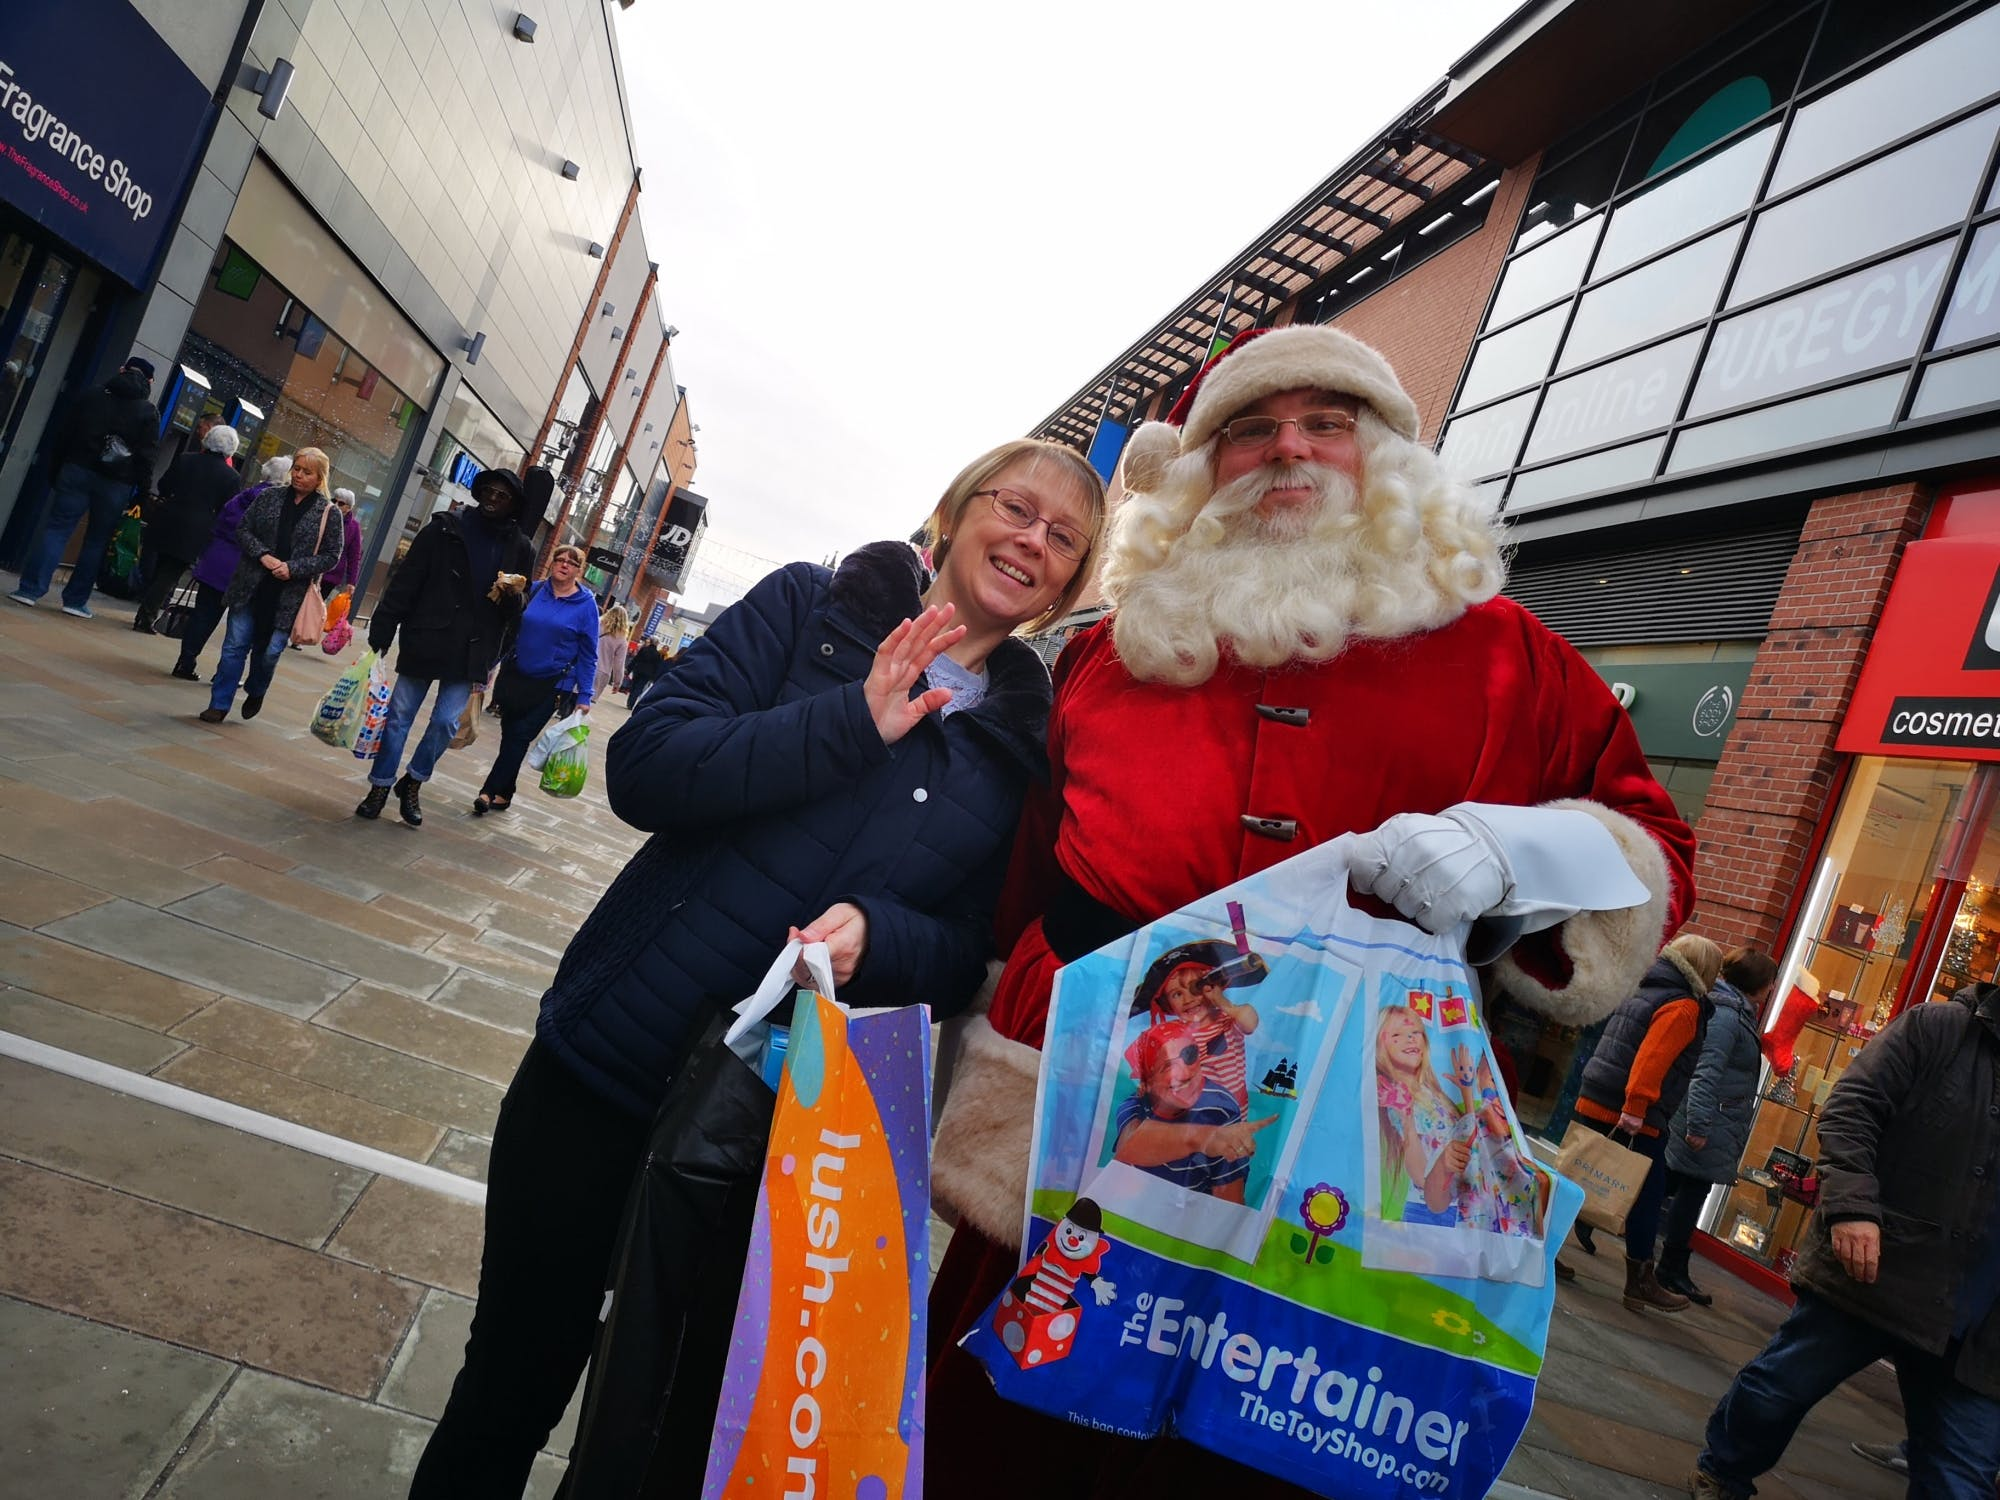 Santa Cash shopping trip and winner